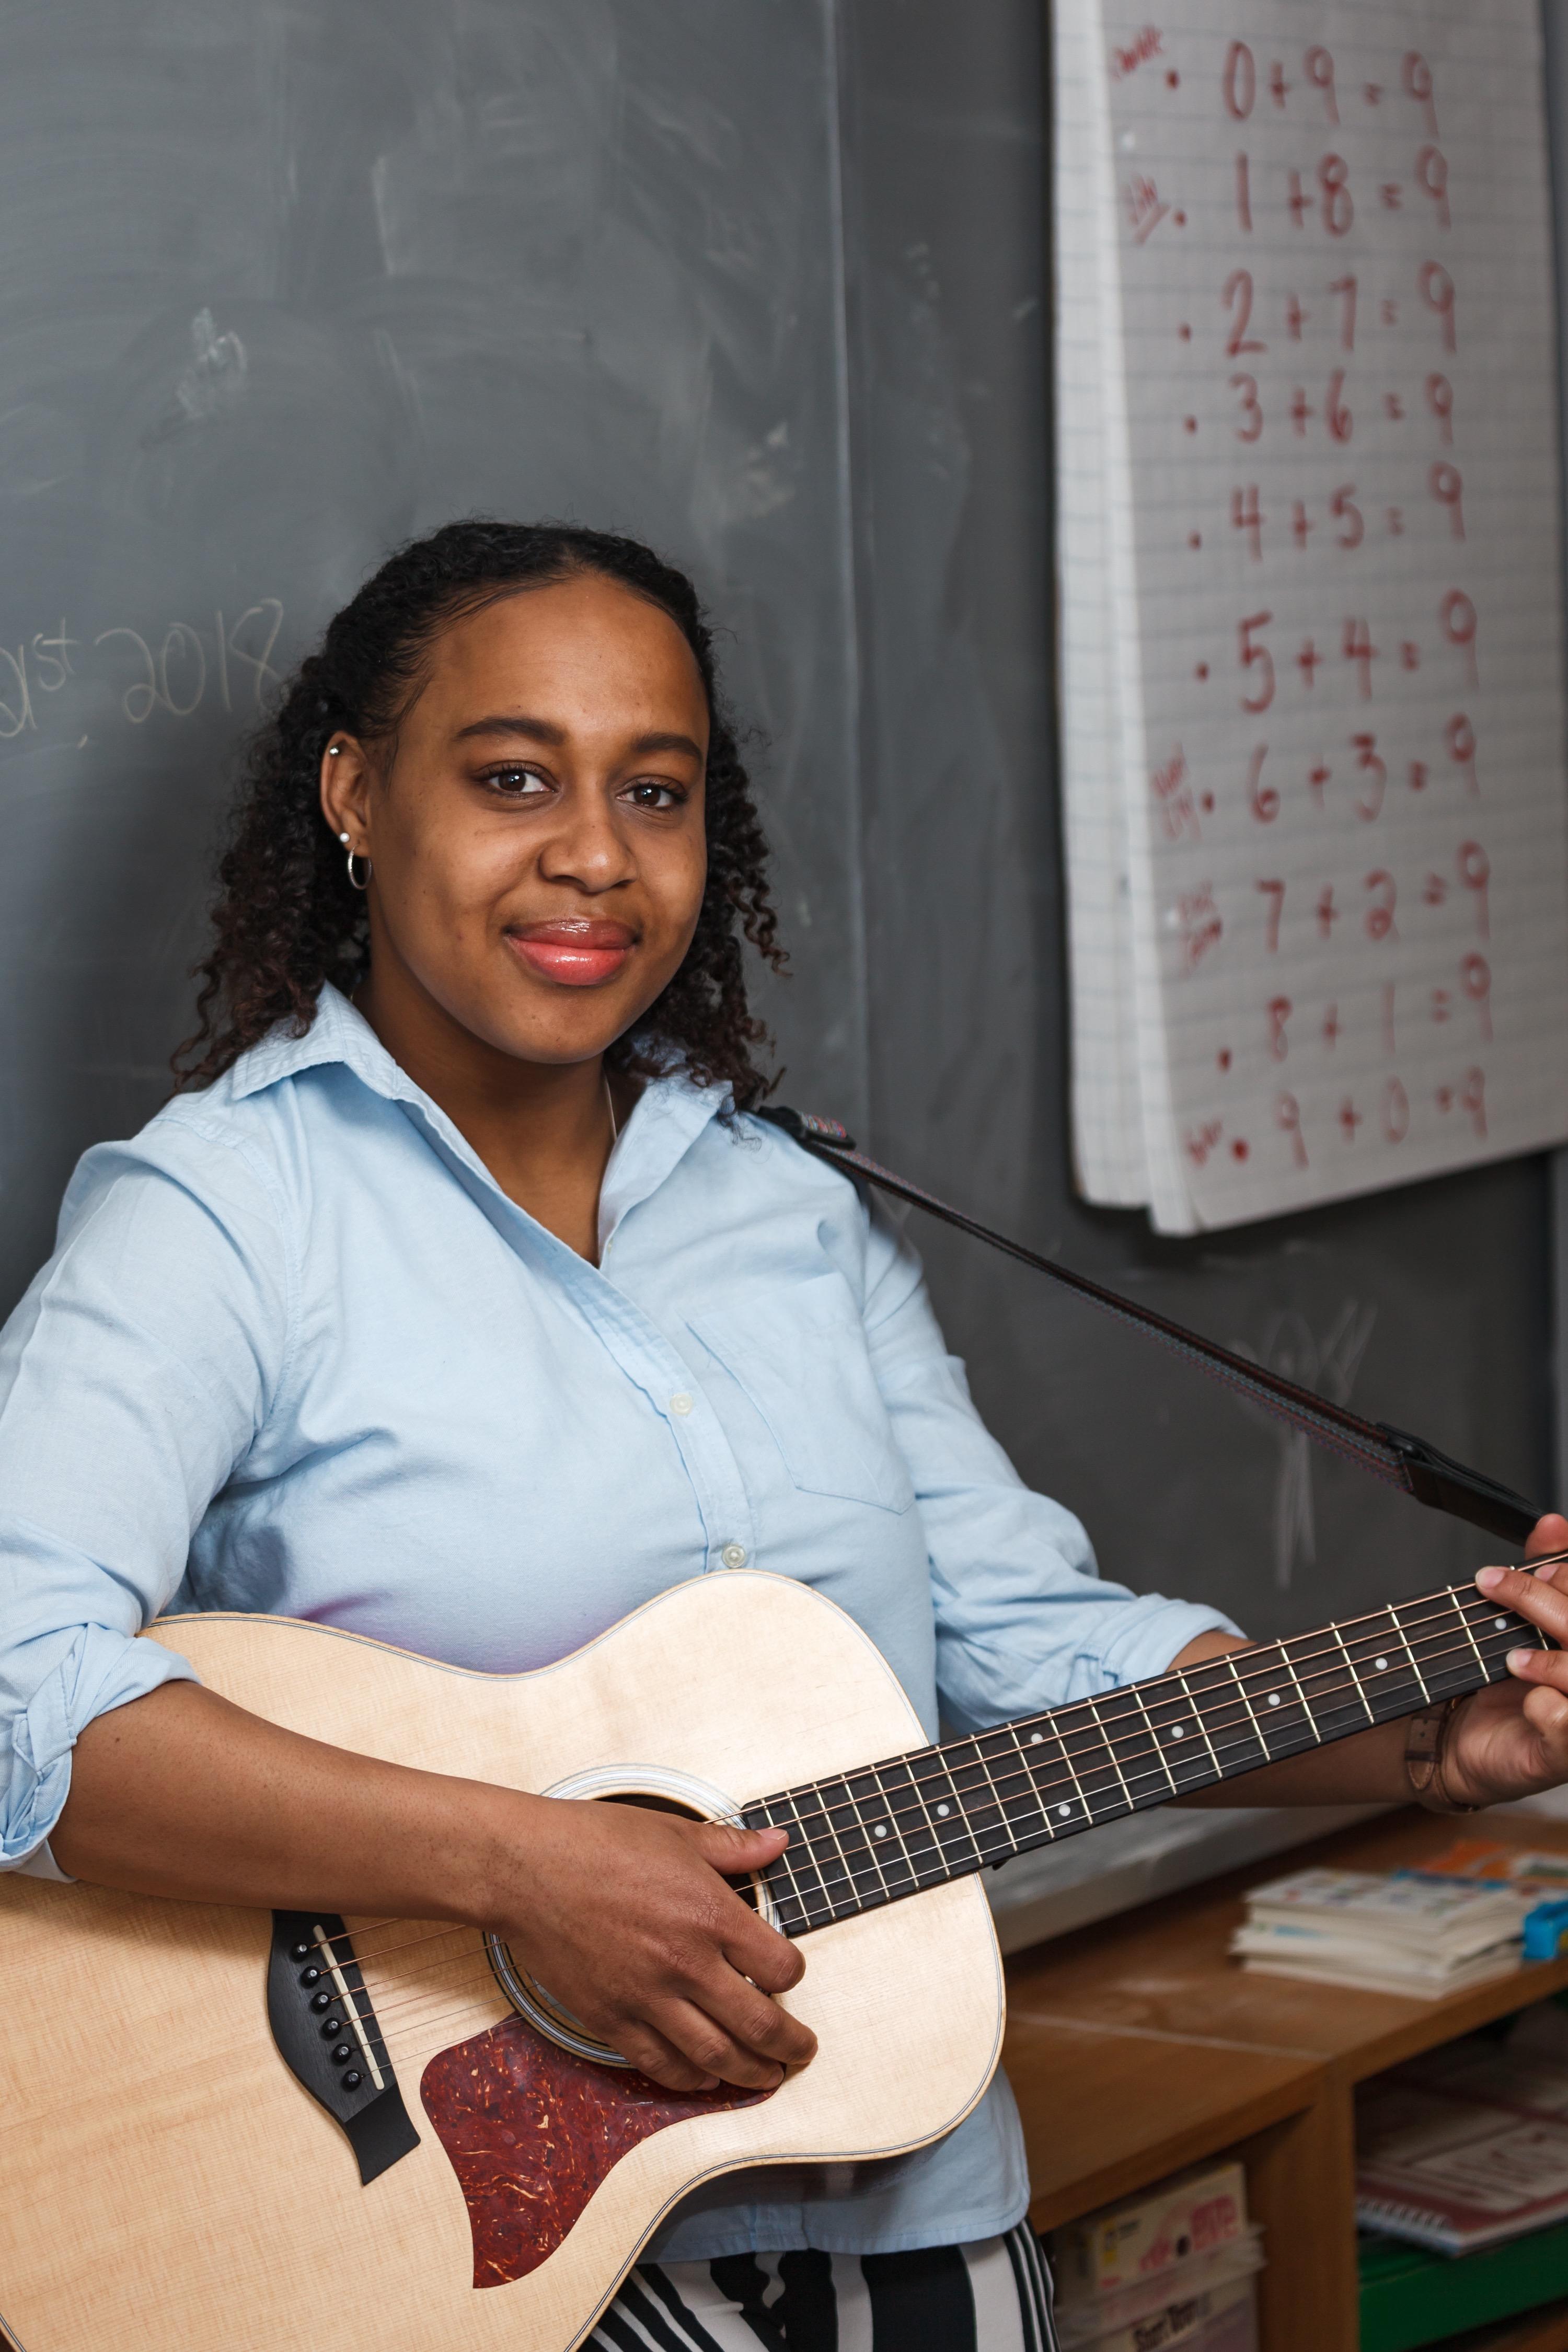 Music Therapy. Children. Youth. School. Education. Academics. Growth. Kingston, Ontario. Halifax, Nova Scotia.